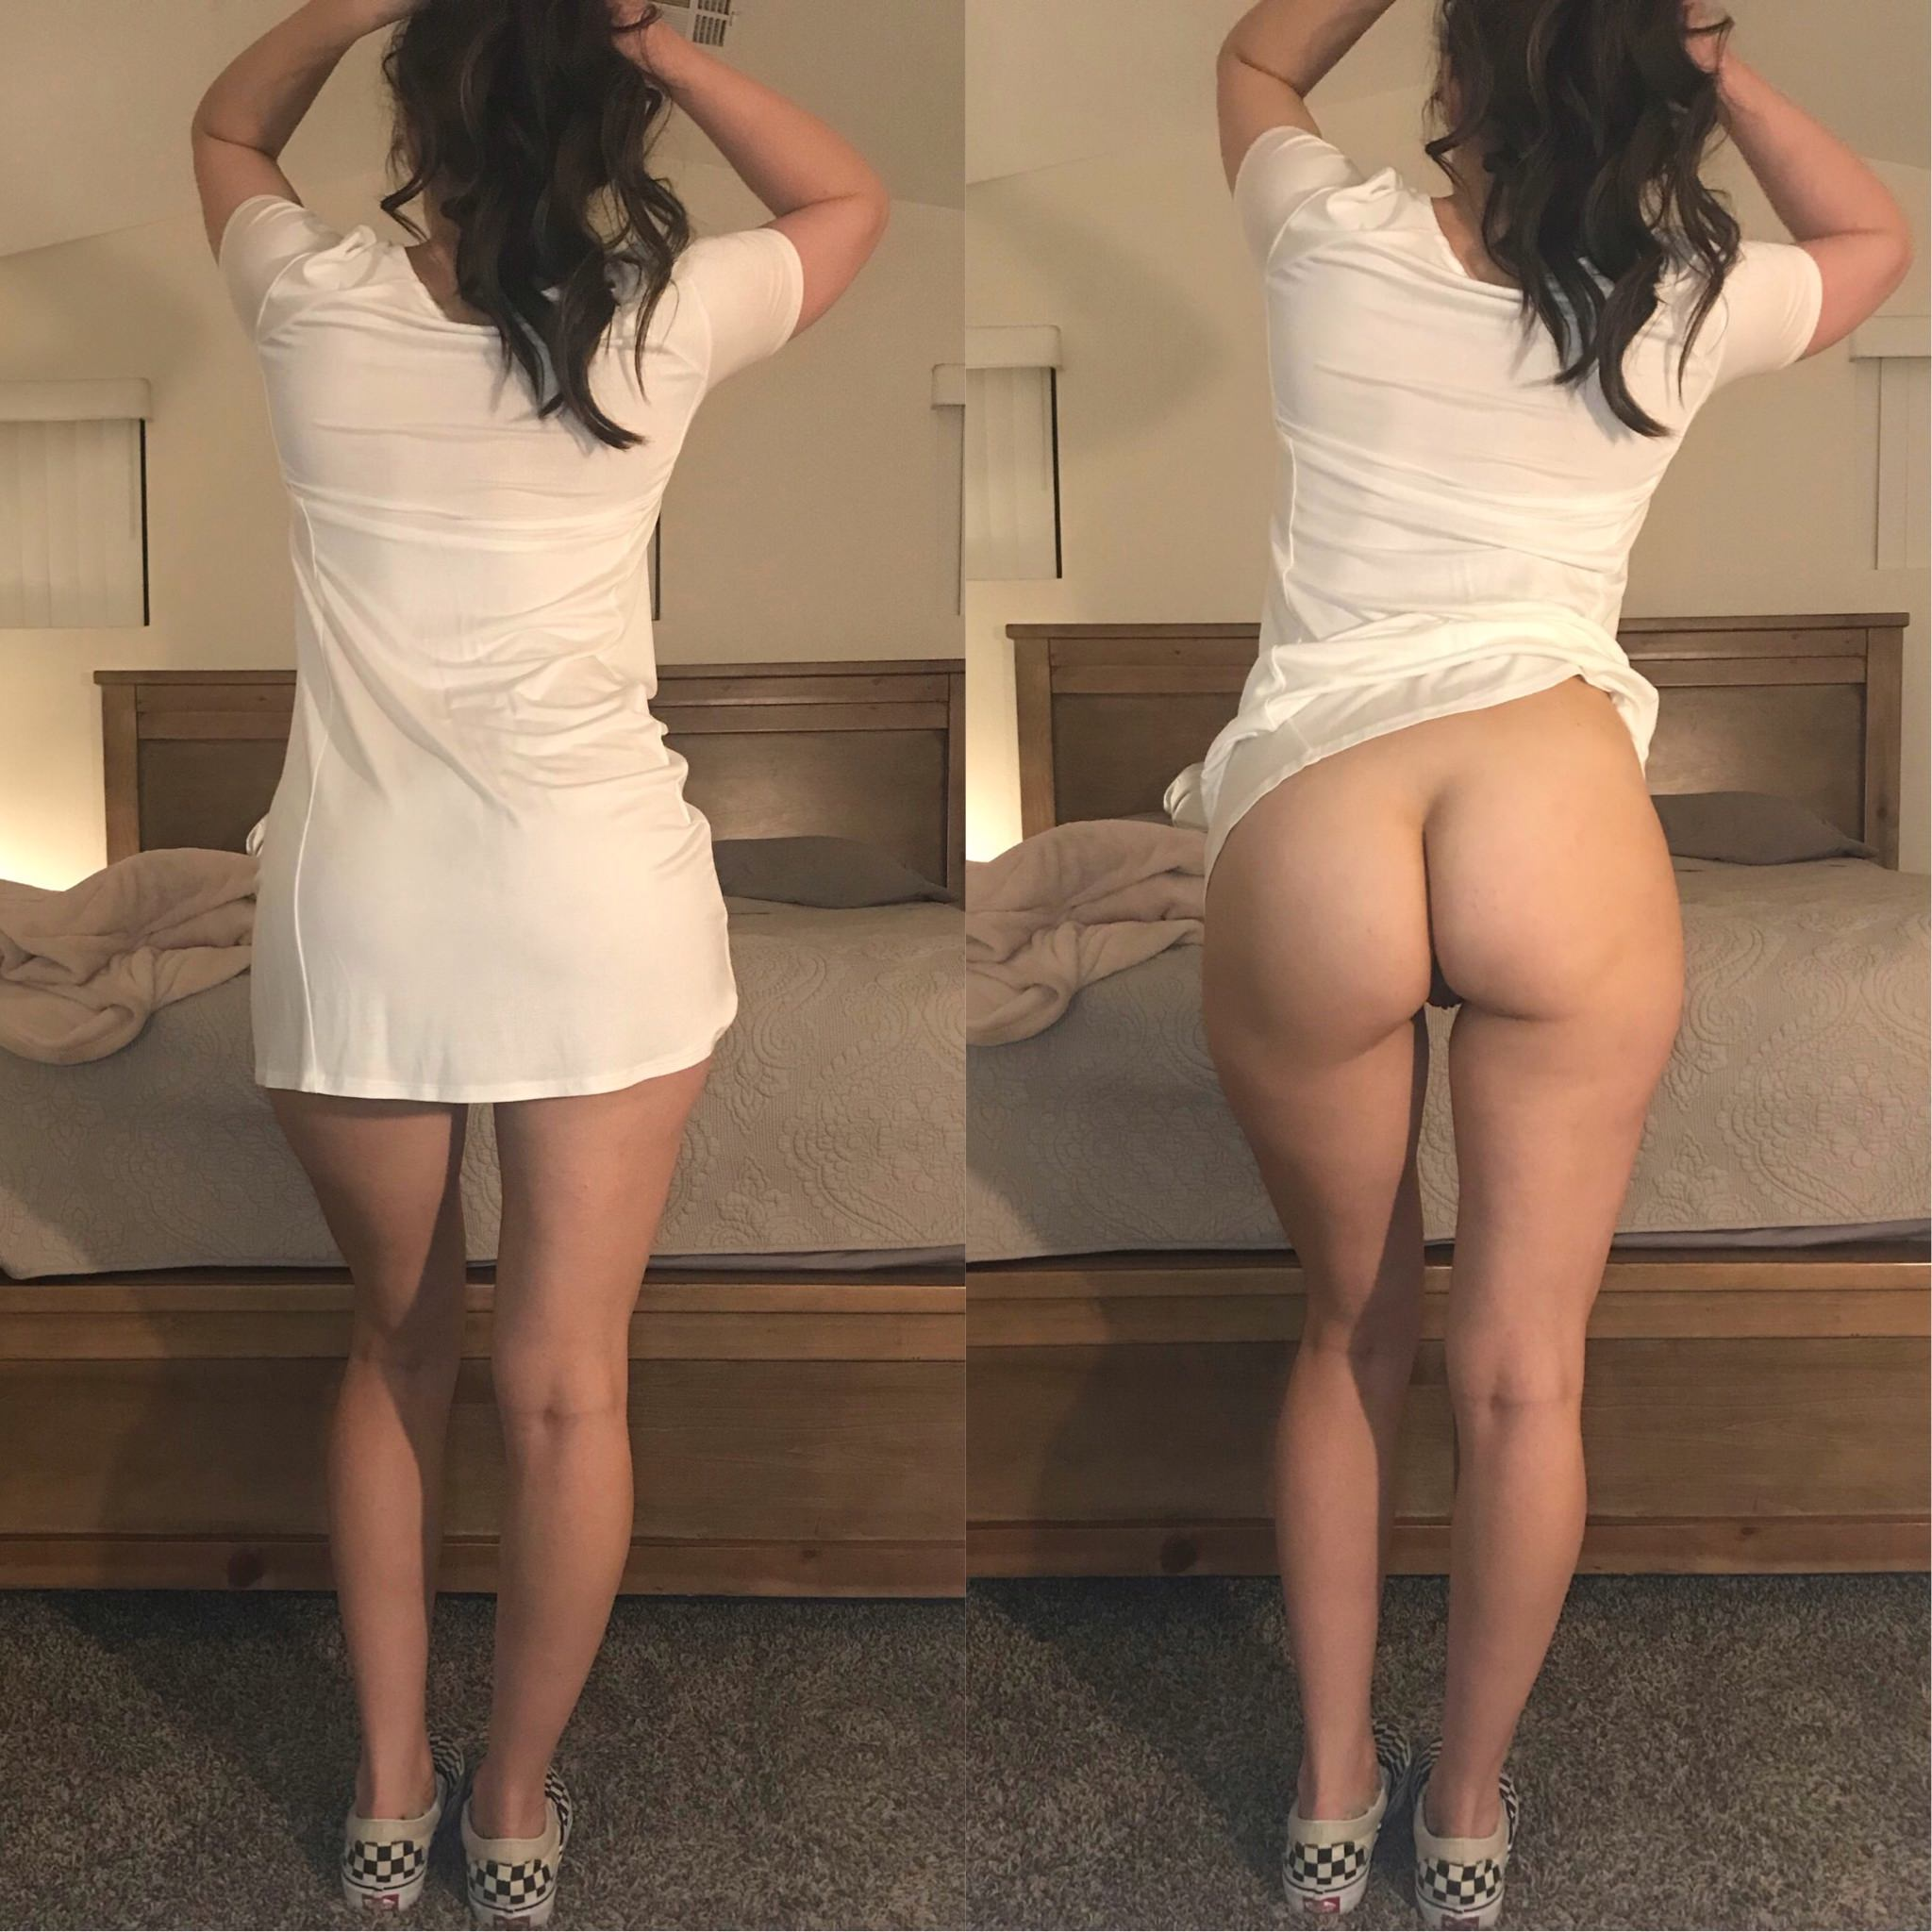 Tiffany Preston Pink Panties